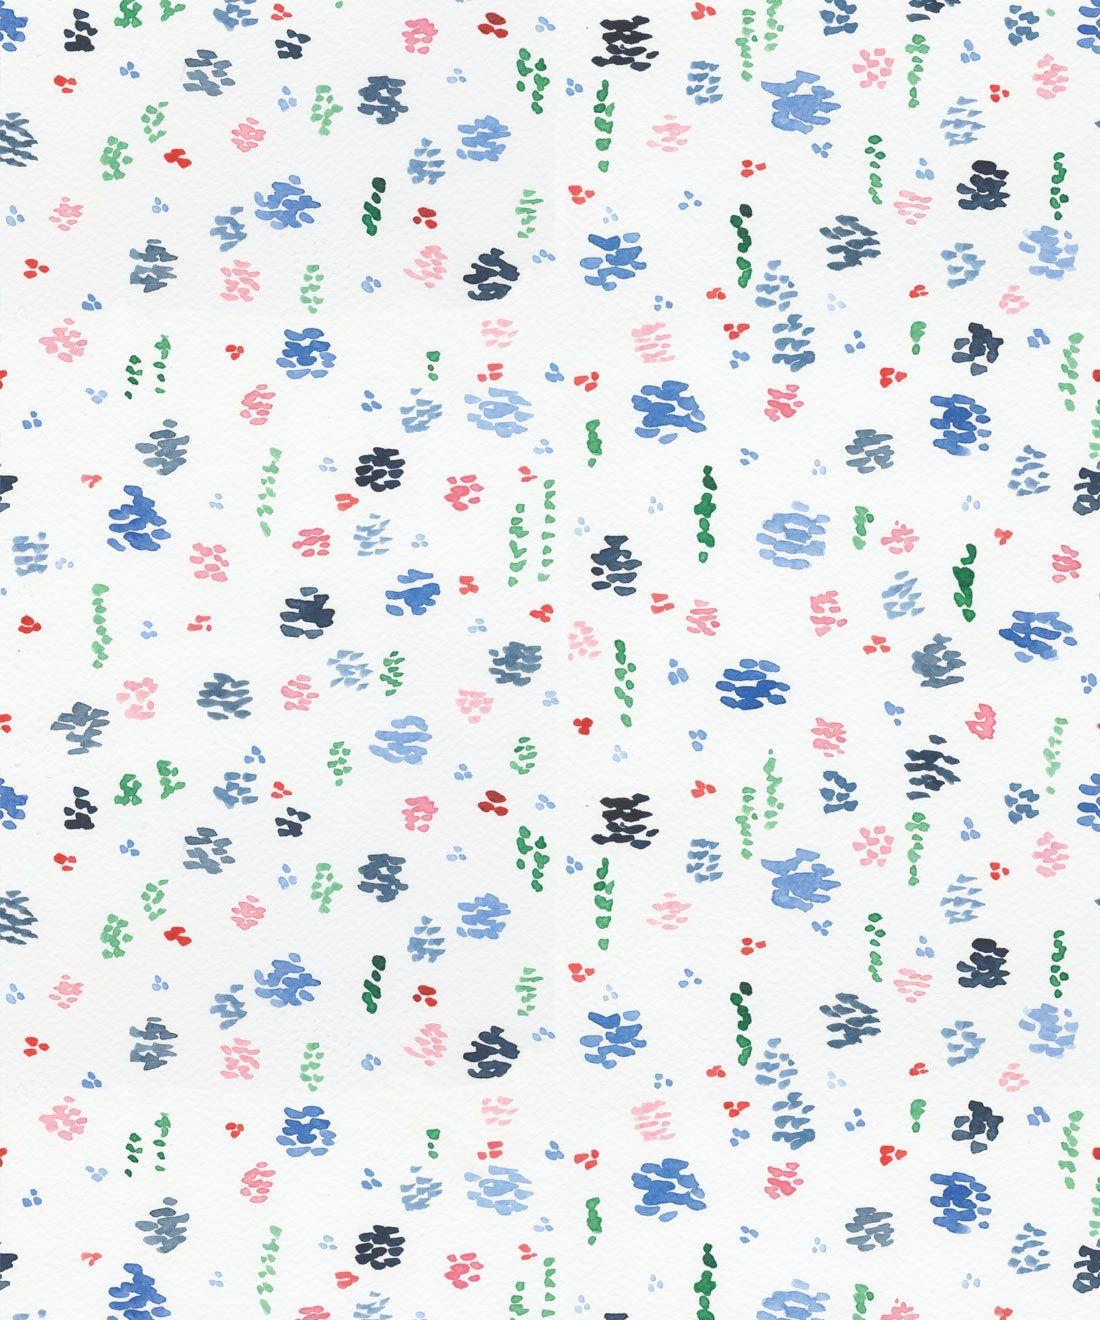 Spring Garden • Blue Floral Wallpaper